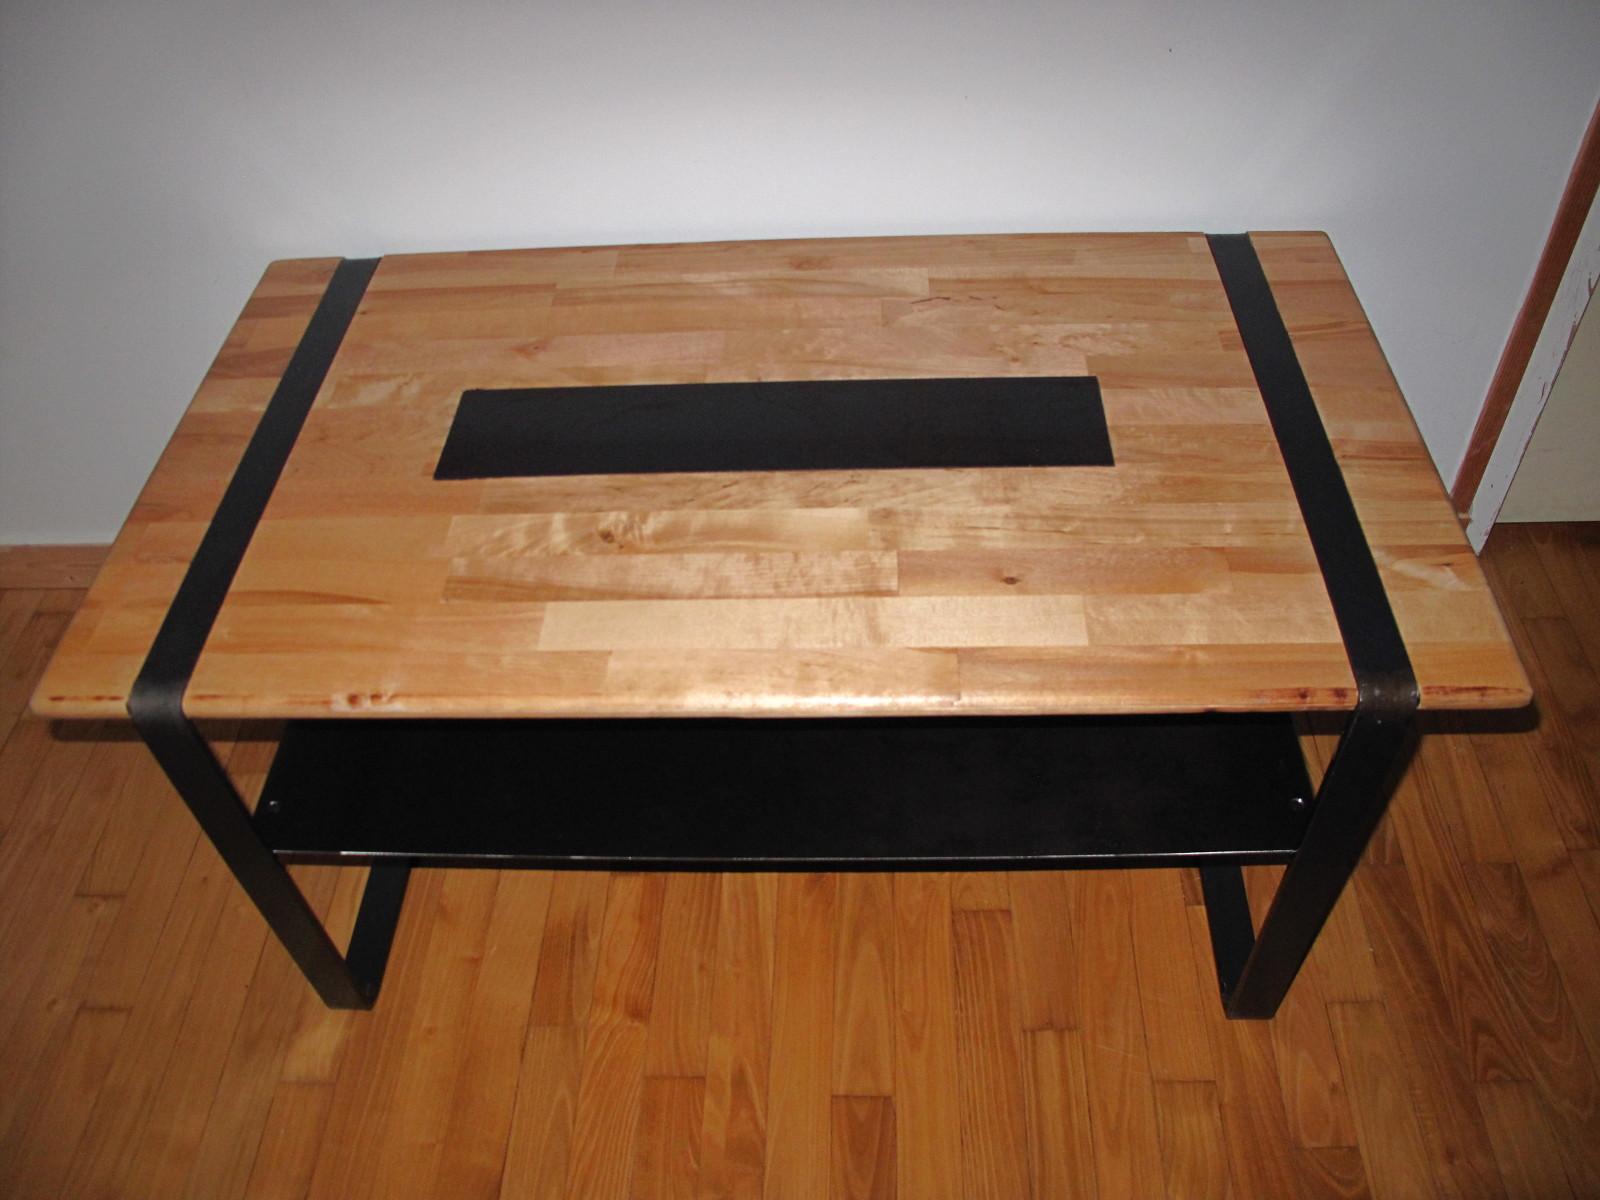 table basse design bois et m tal soudure atypique. Black Bedroom Furniture Sets. Home Design Ideas